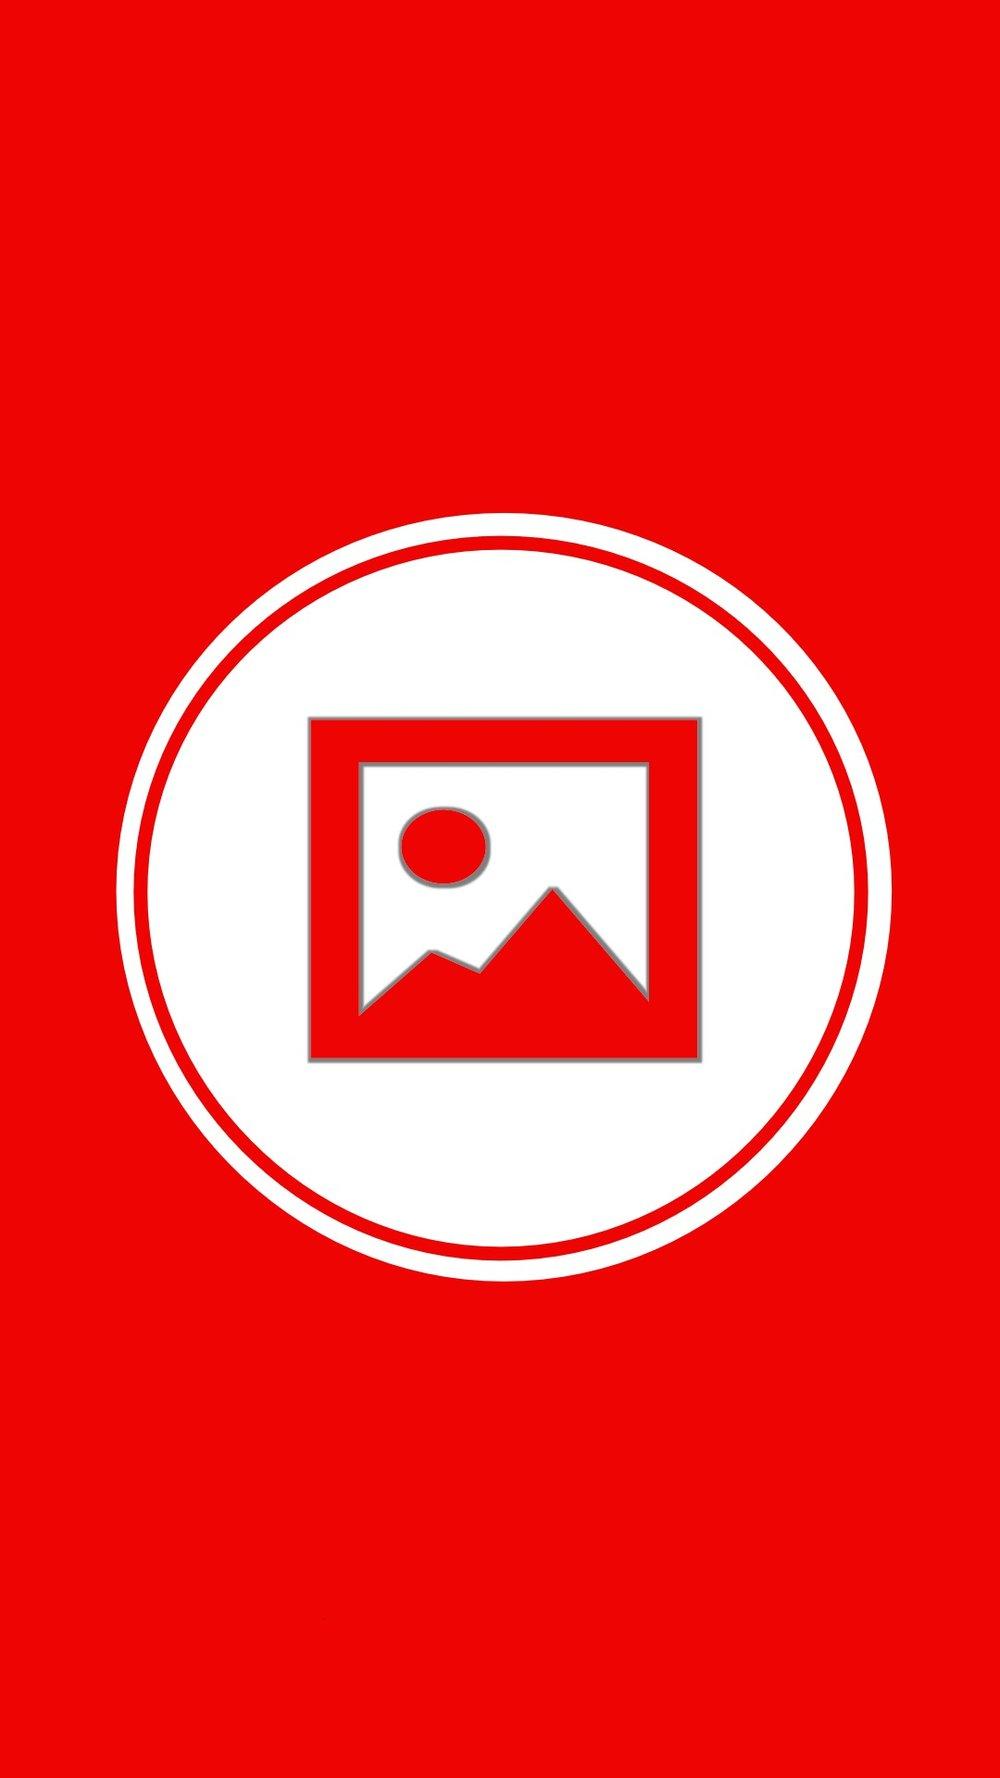 Instagram-cover-photoicon-red-lotnotes.com.jpg